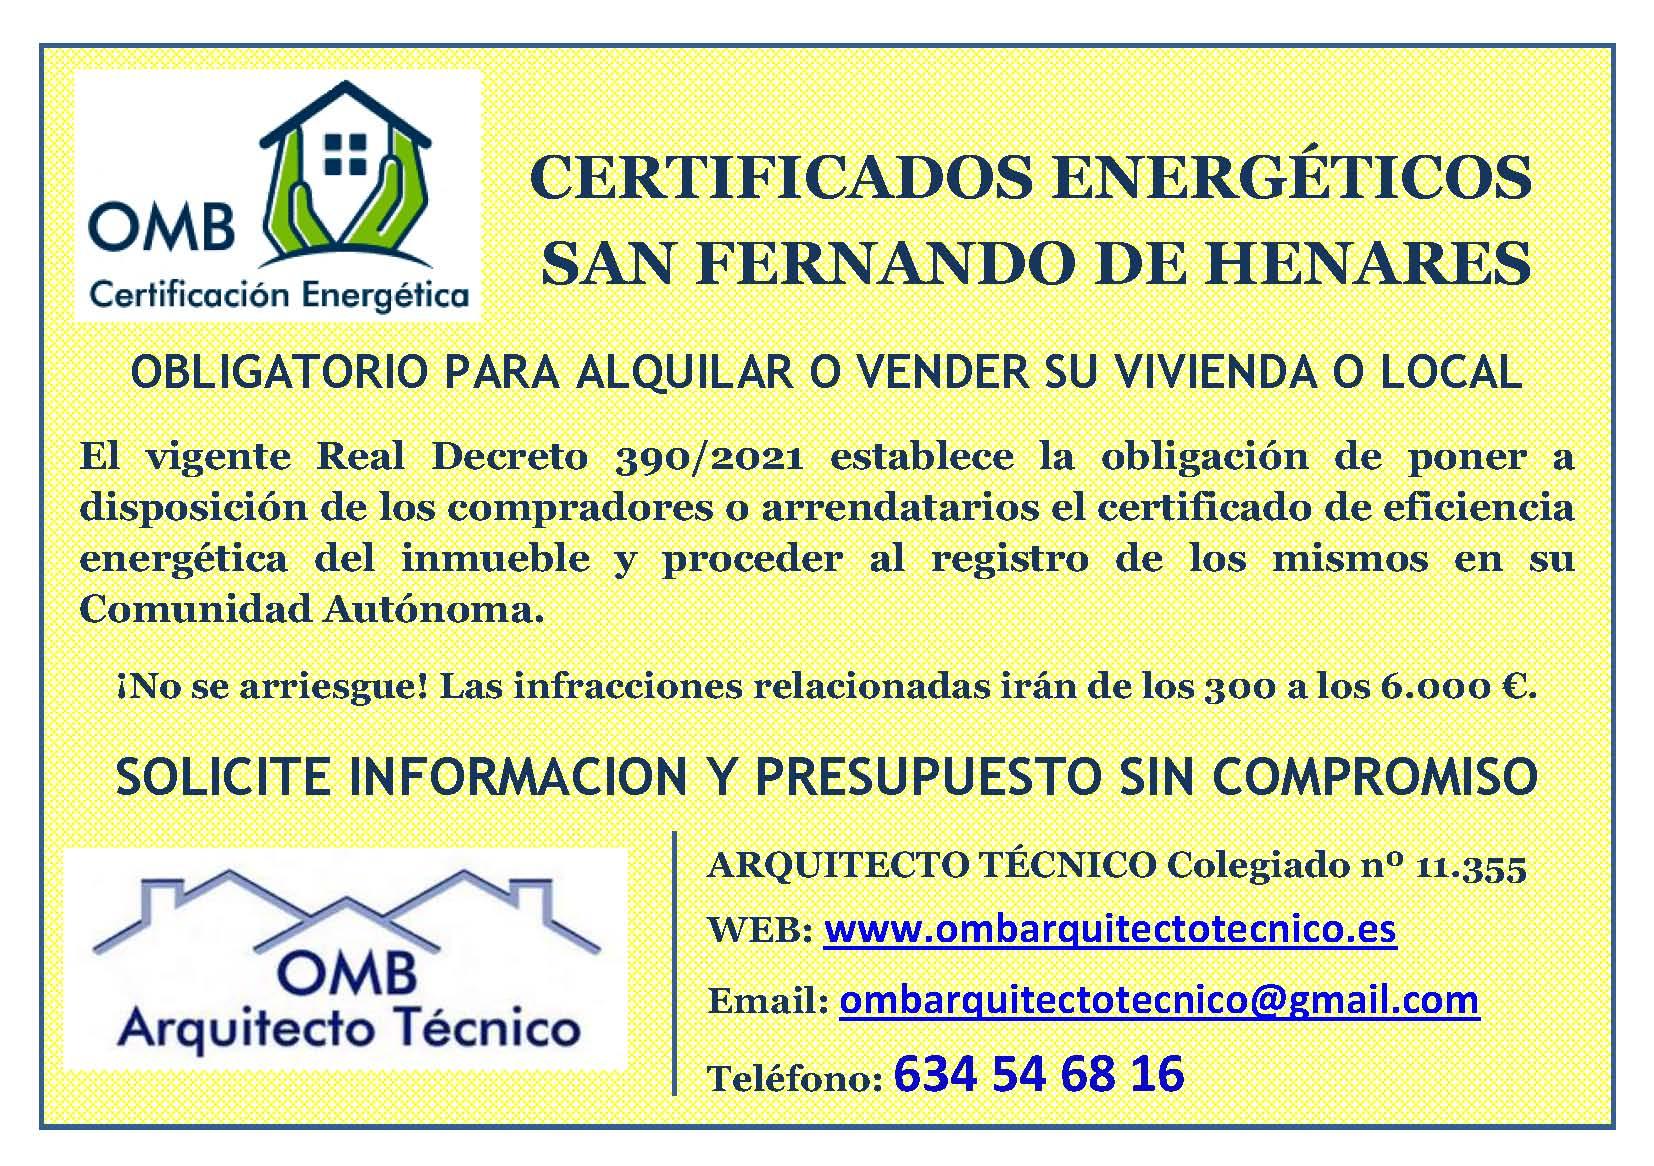 certificado-energ%C3%A9tico-san-fernando-de-henares-madrid-certificado-de-eficiencia-energ%C3%A9tica-obligatorio-omb-certificaci%C3%B3n-energ%C3%A9tica-madrid-omb-arquitecto-t%C3%A9cnico-oscar-millano-berm%C3%BAdez.jpg